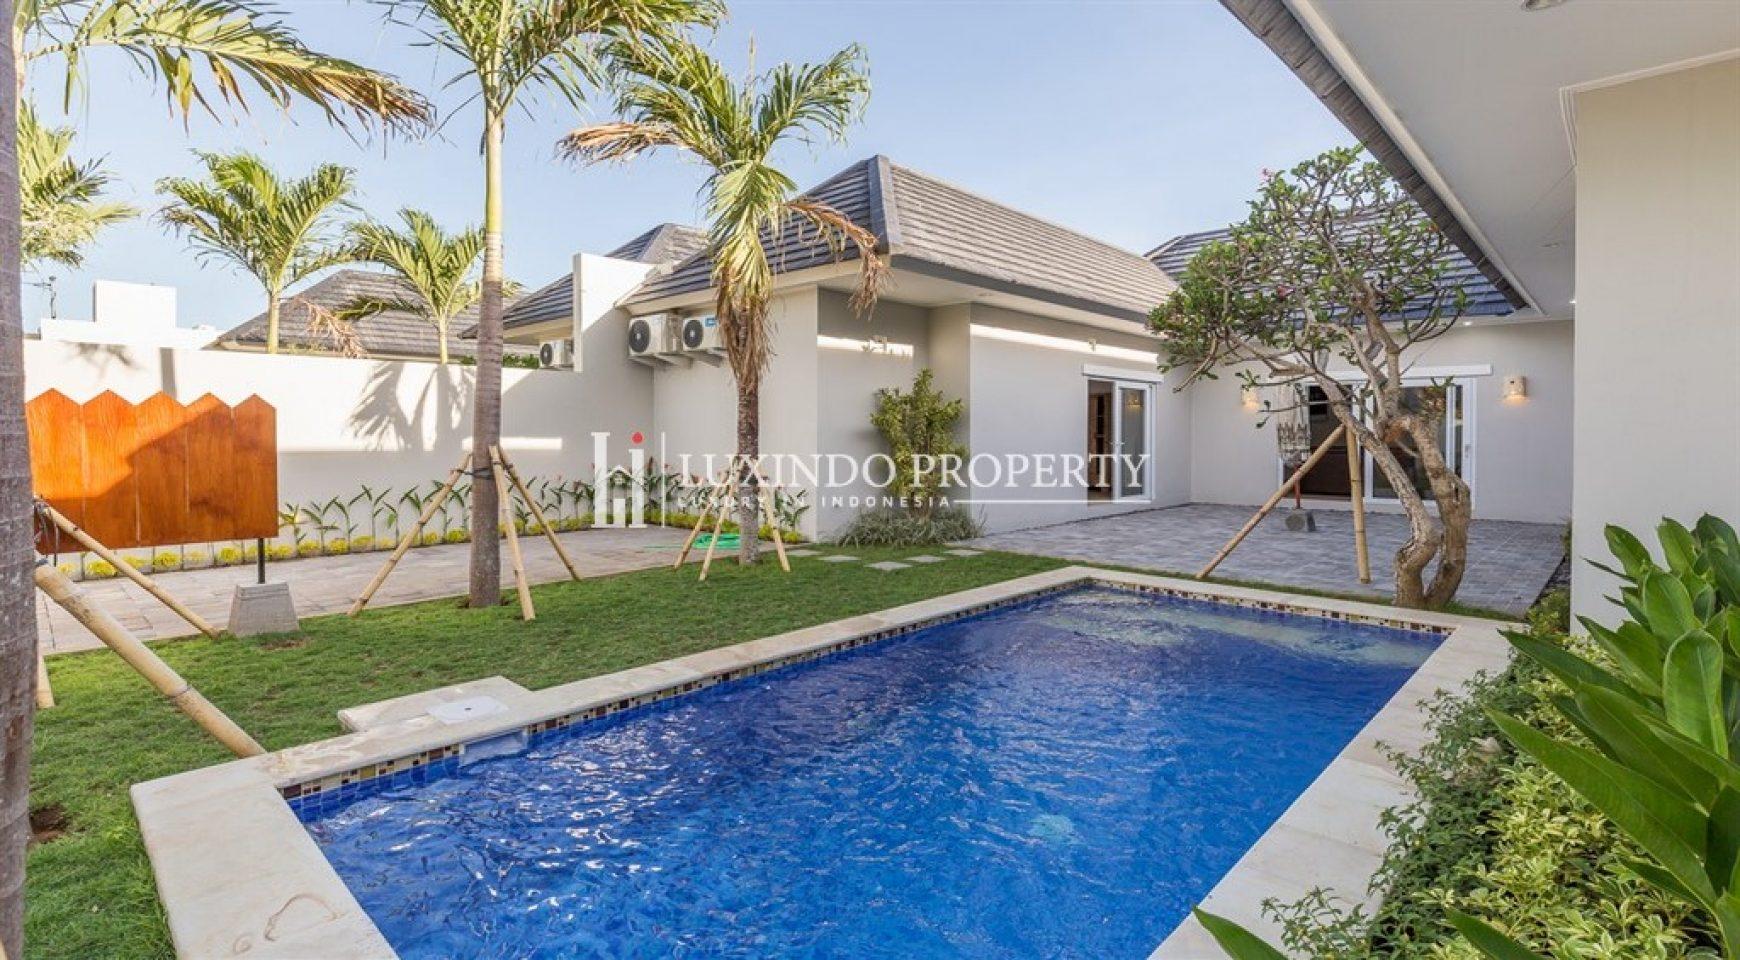 Sanur Bali Brand New 3 Bedroom Villa In The Center Of Sanur Lhv182 Luxindo Property